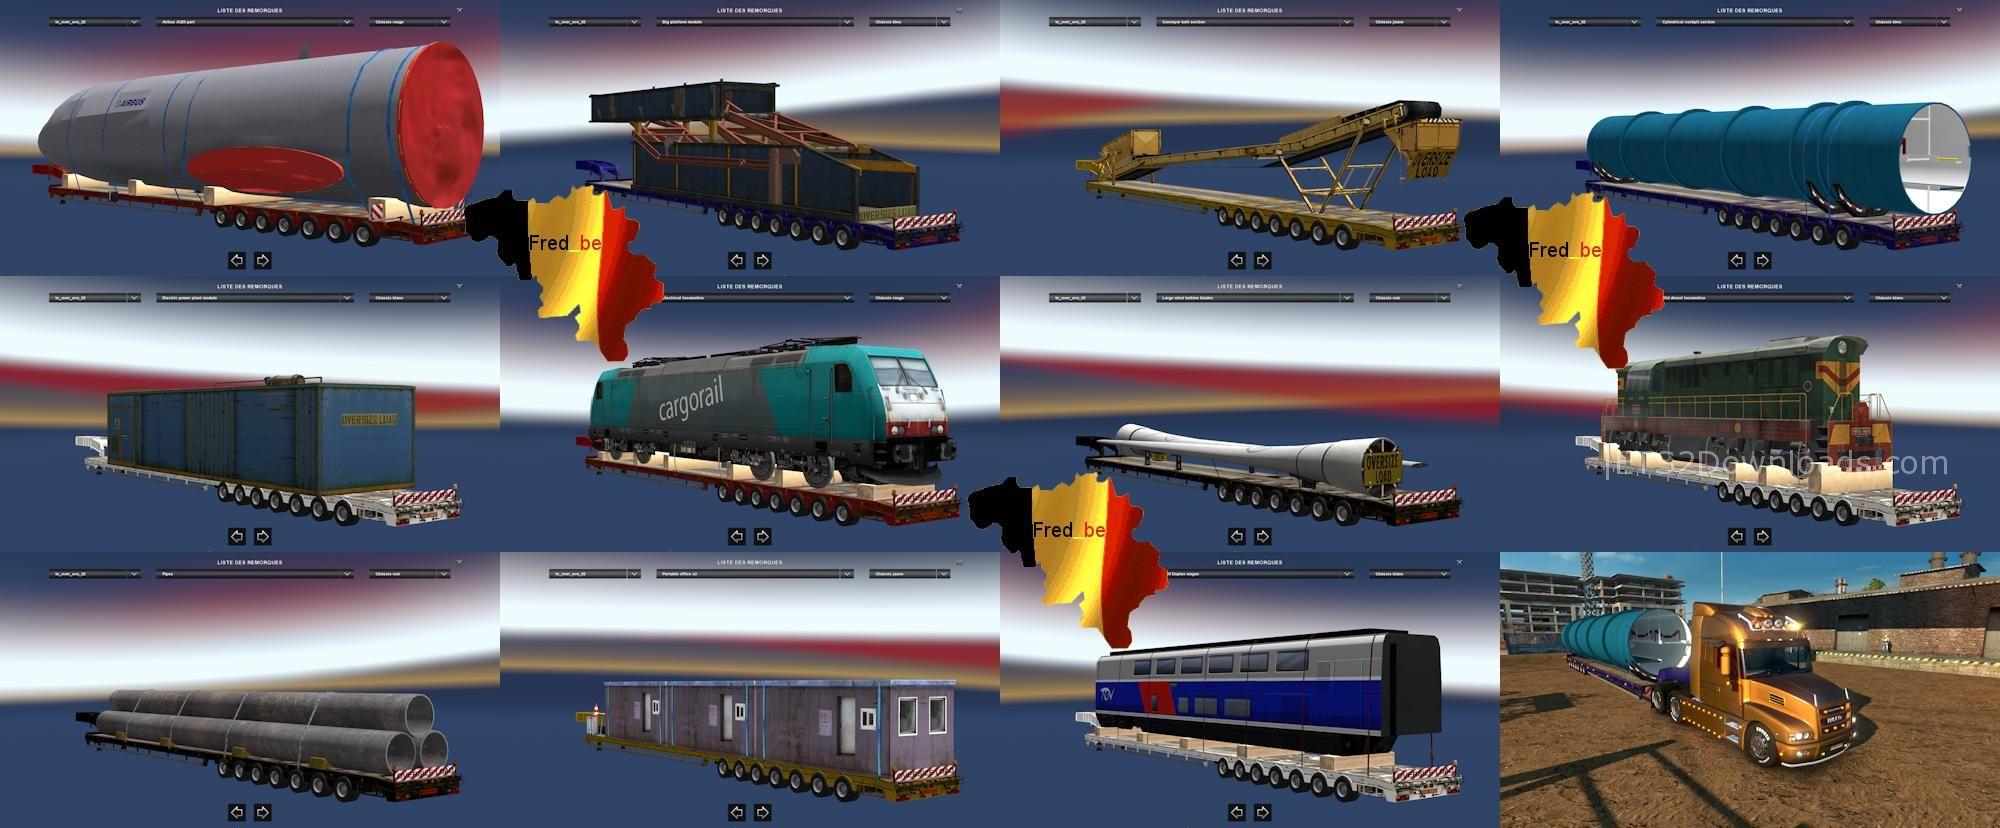 oversize-trailer-1